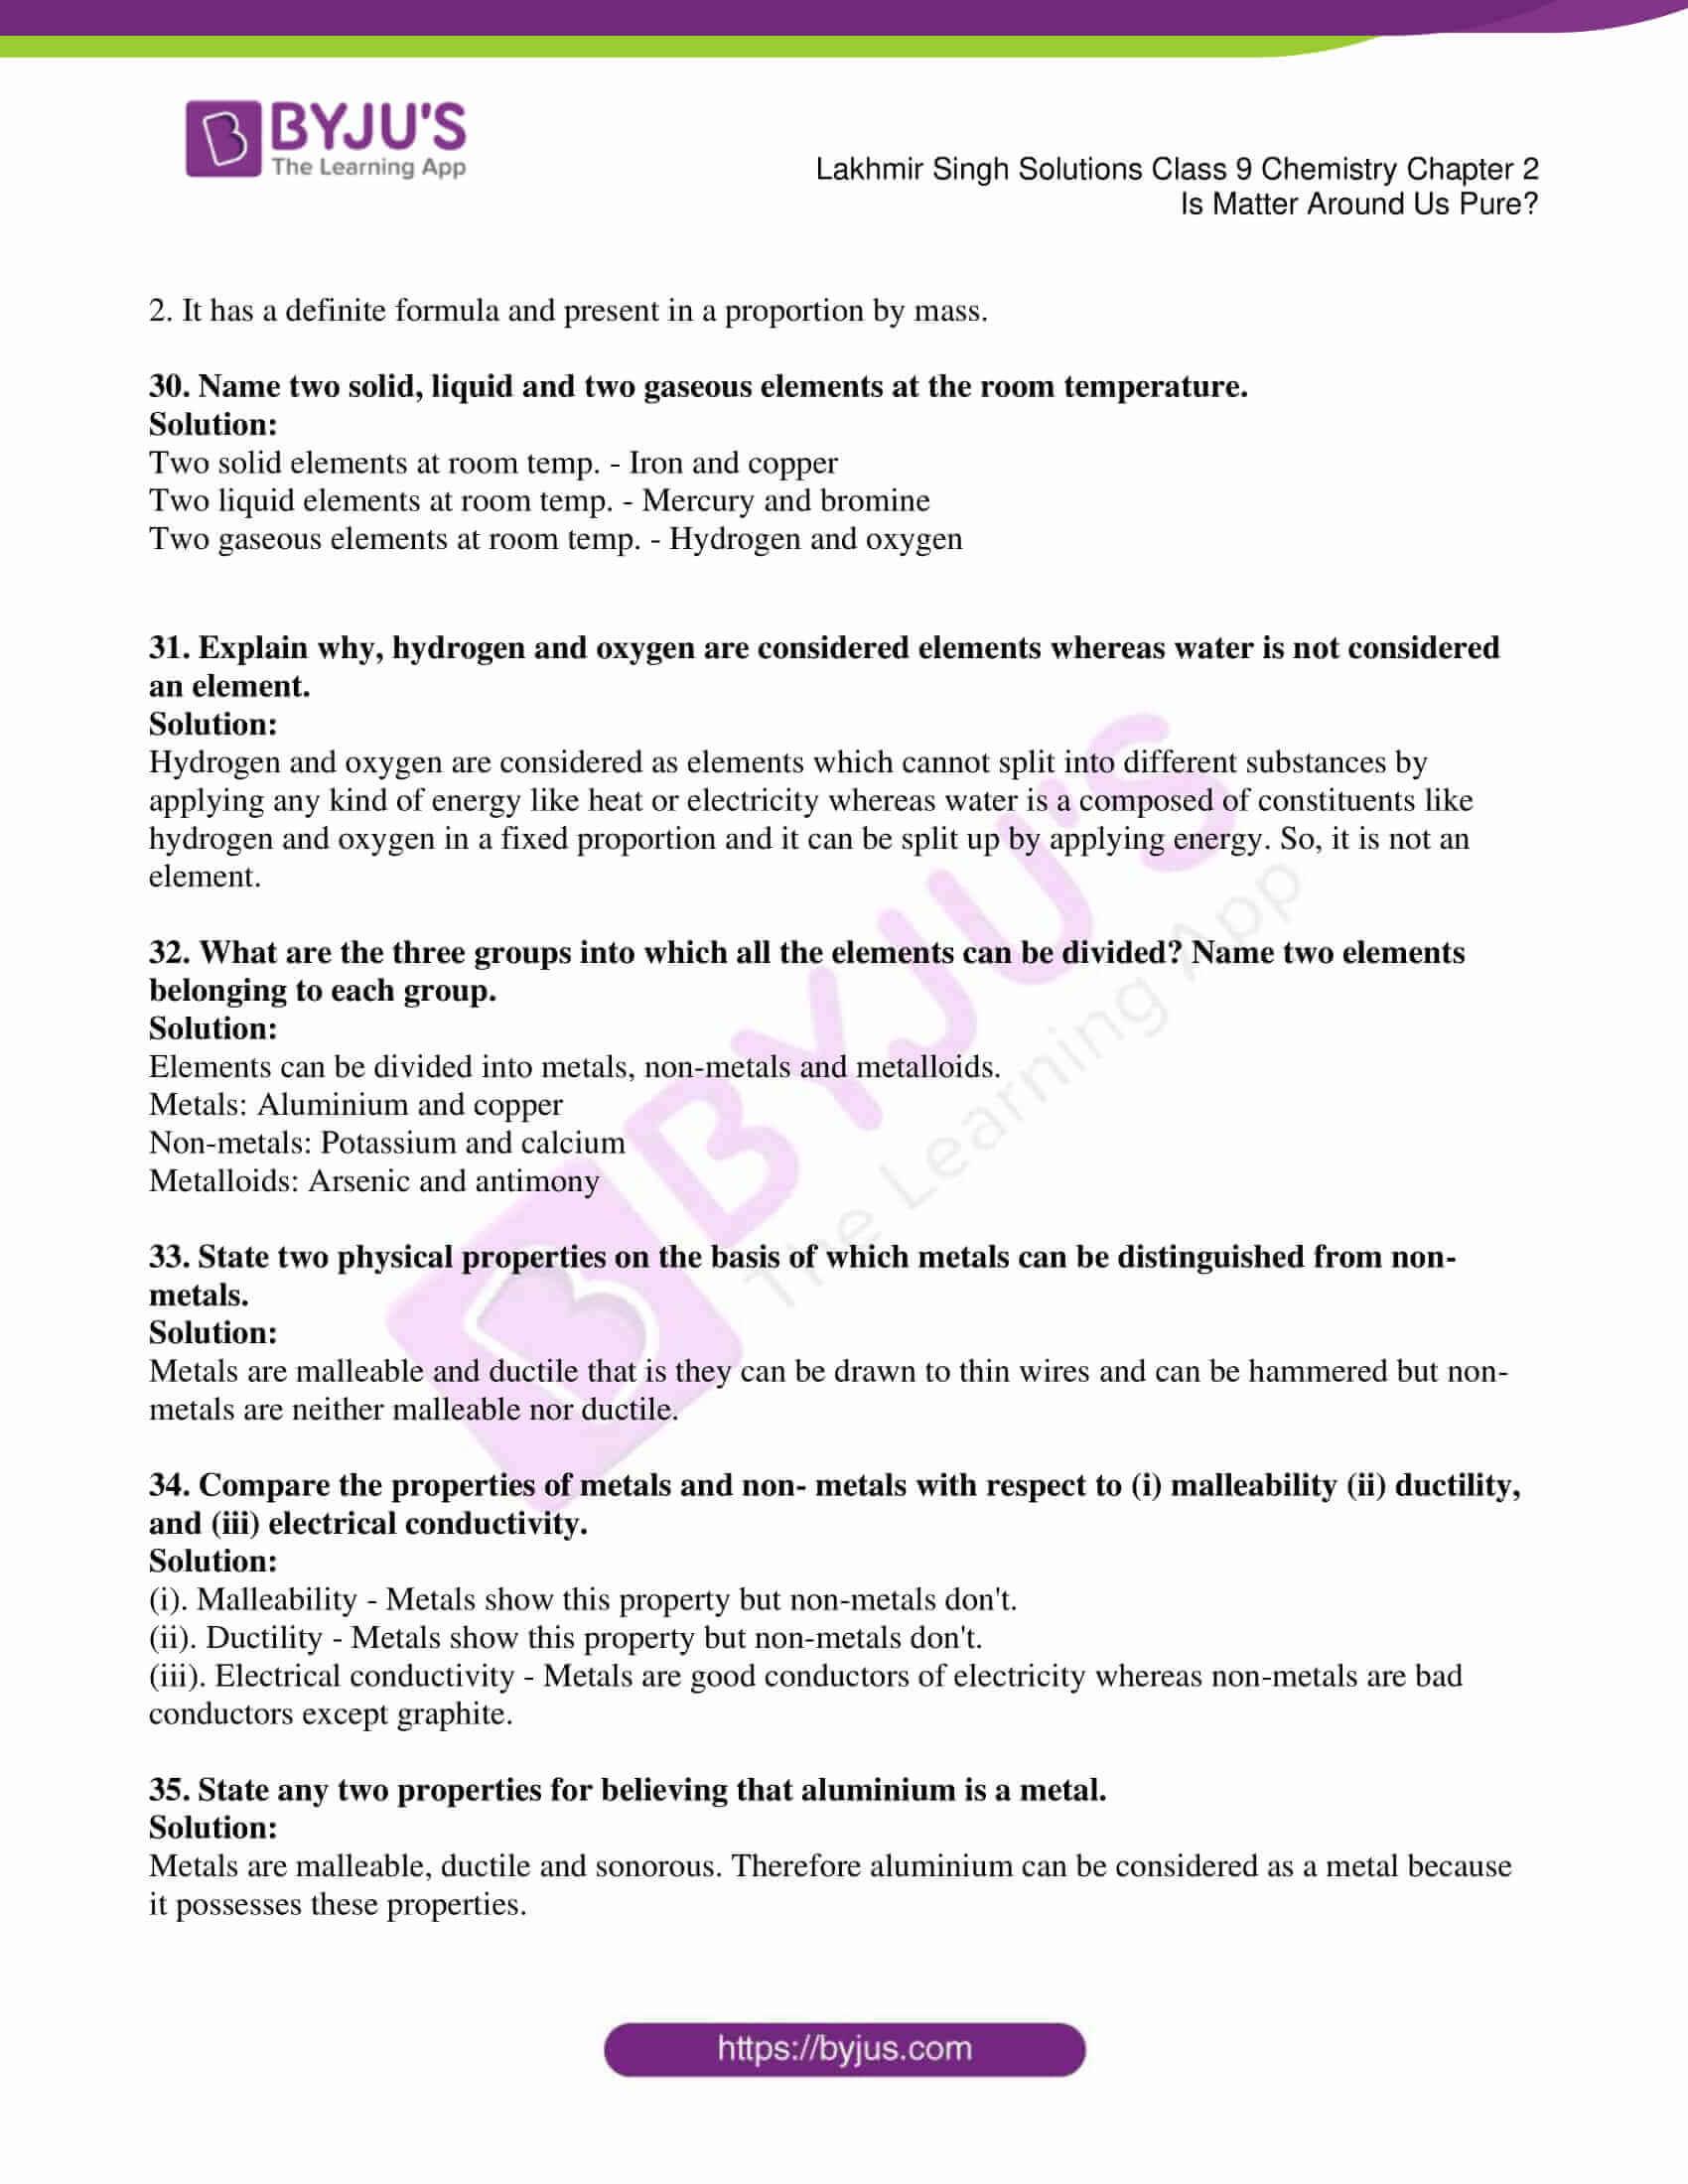 lakhmir singh solutions class 9 chemistry chapter 2 05